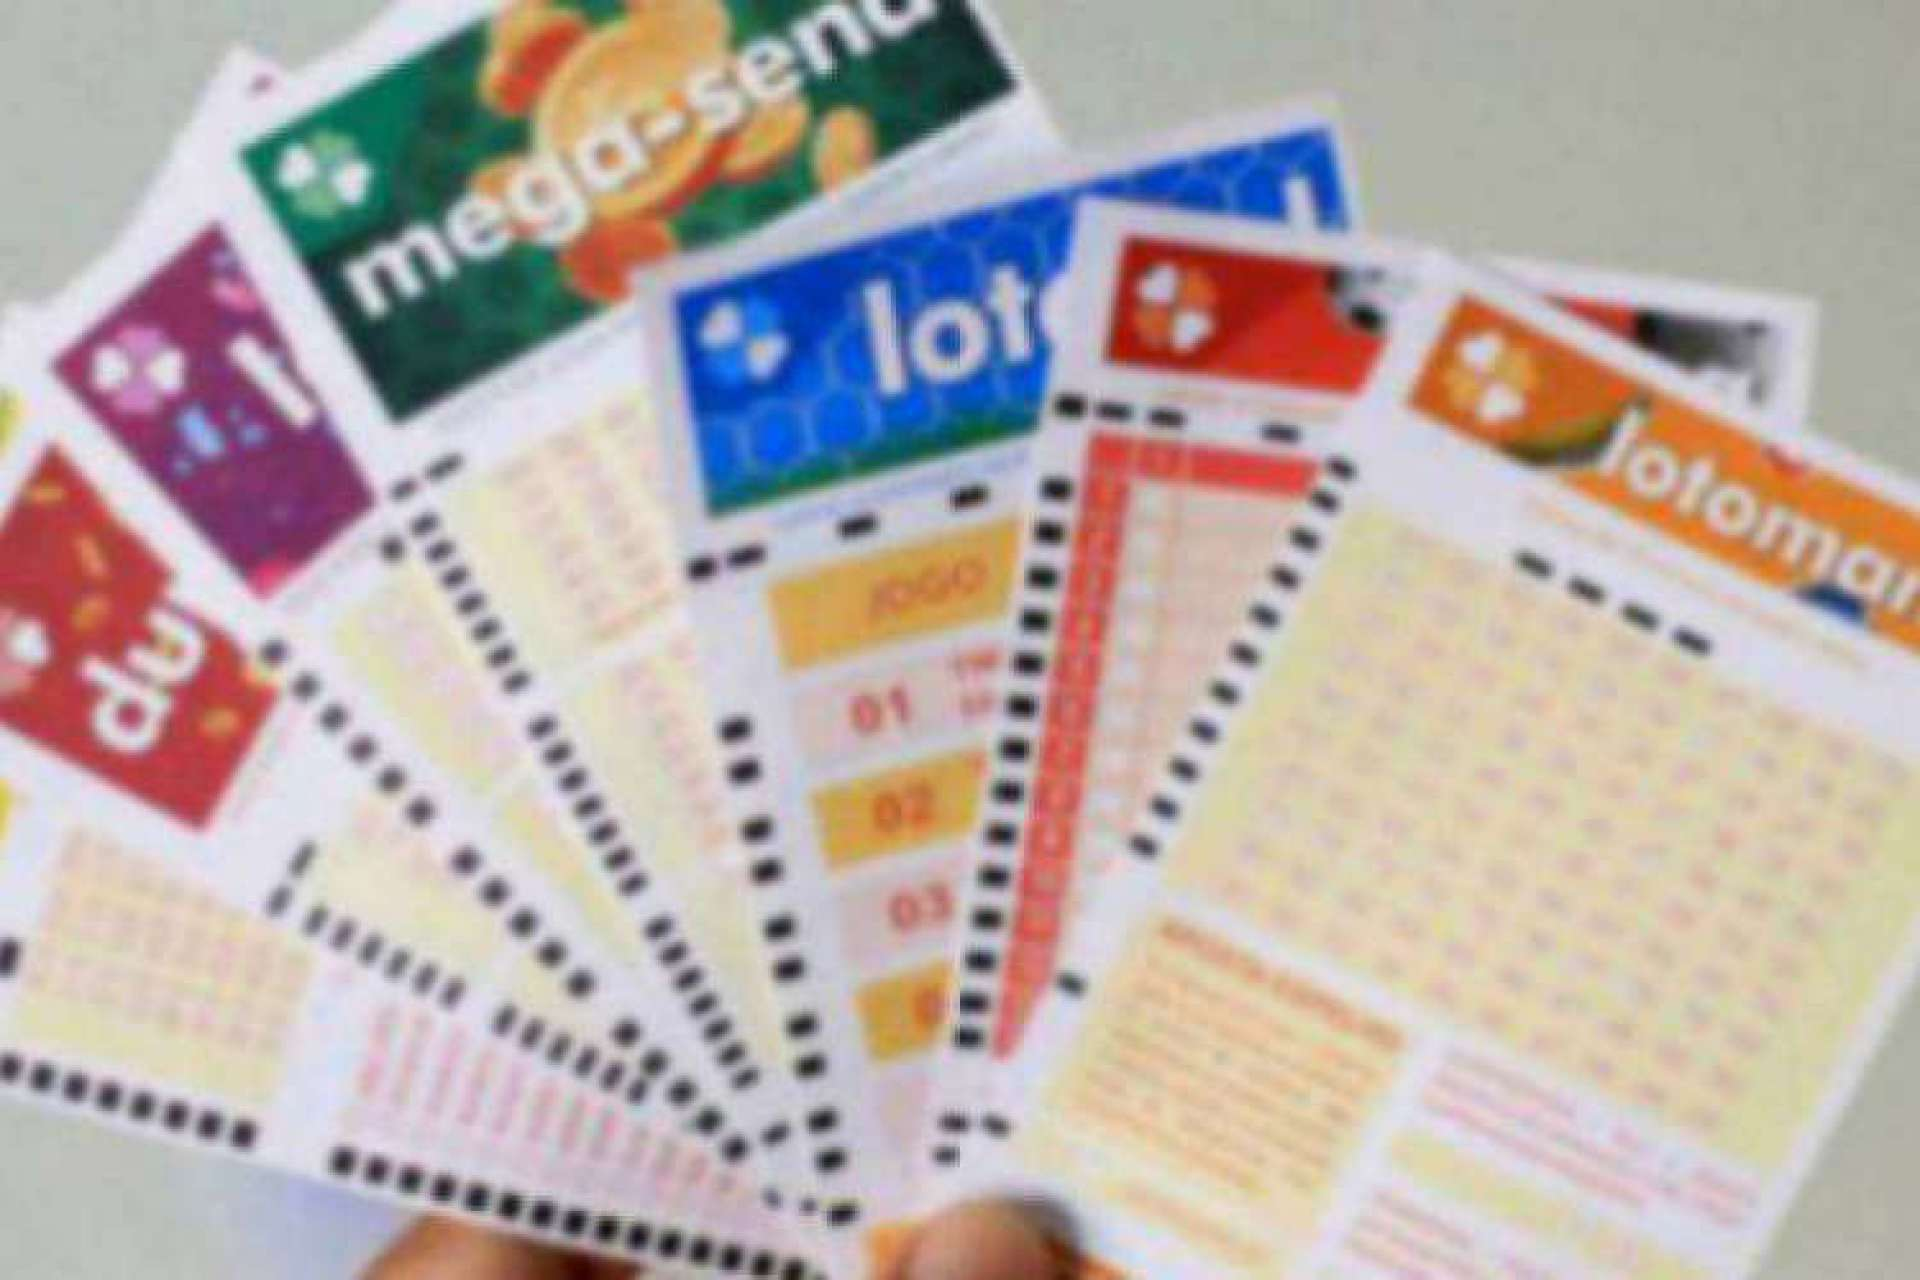 Loteria Federal: resultado do concurso 5482